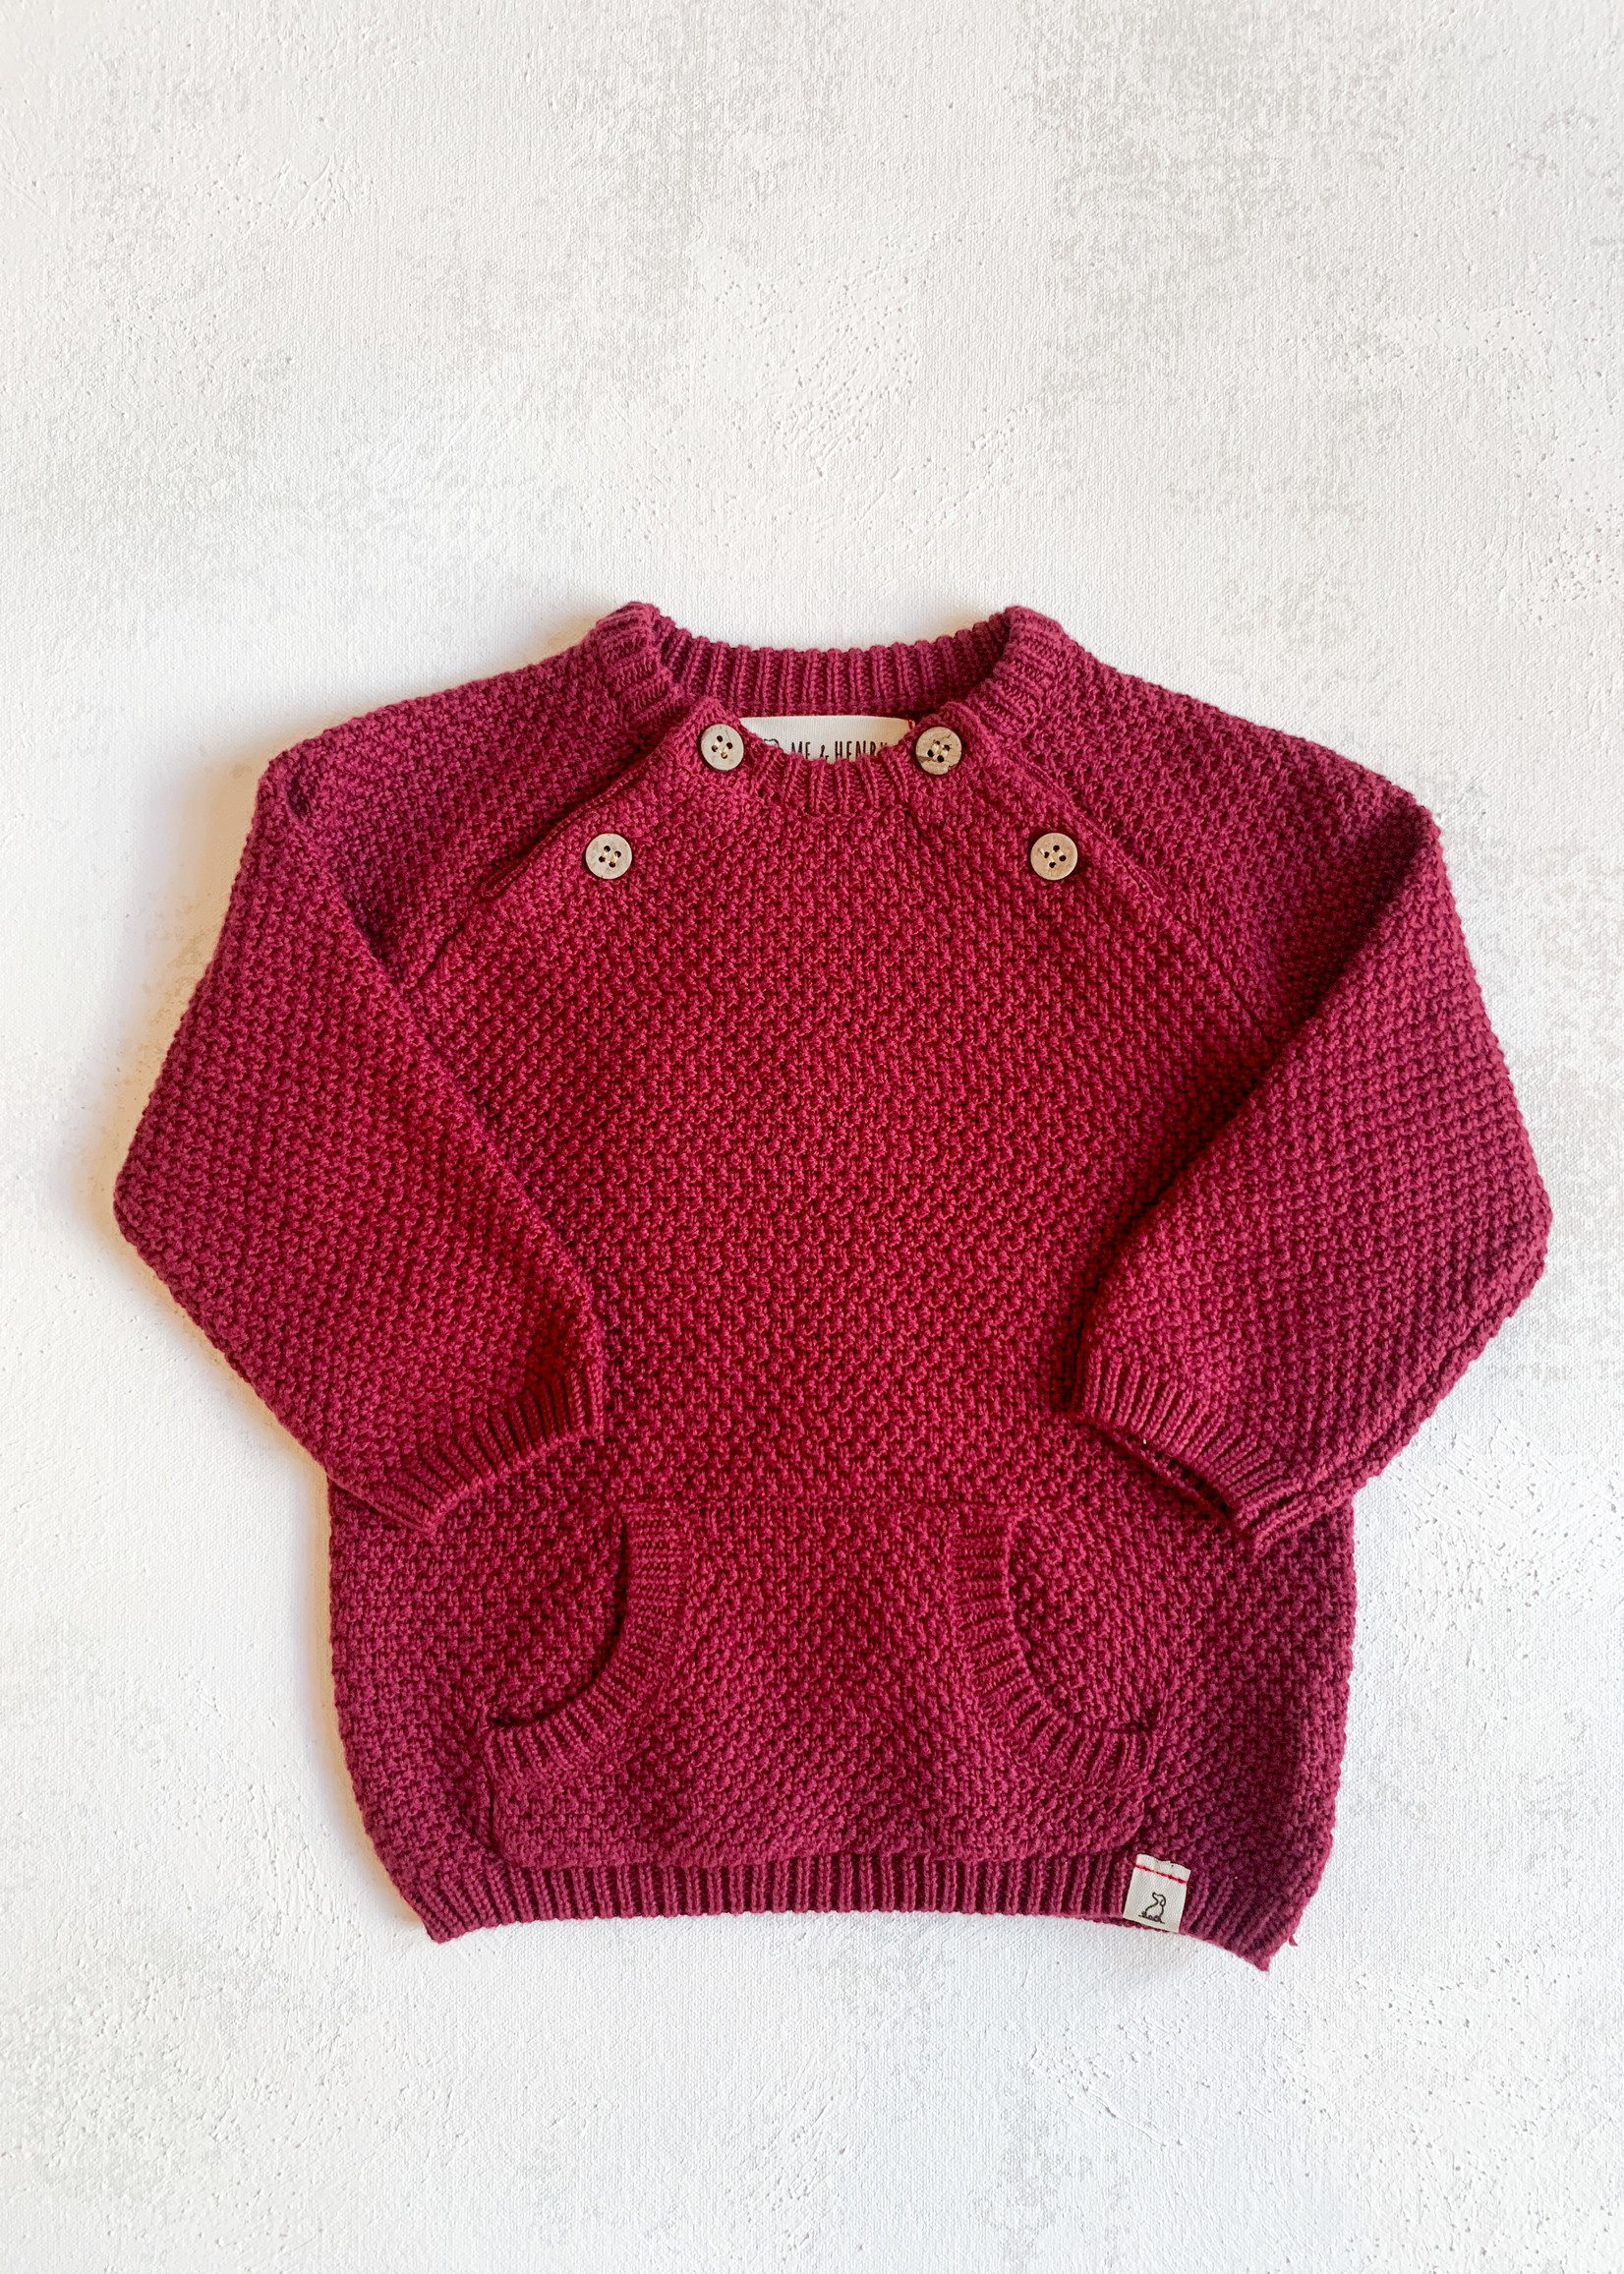 Elitaire Petite The Morrison Sweater in Wine